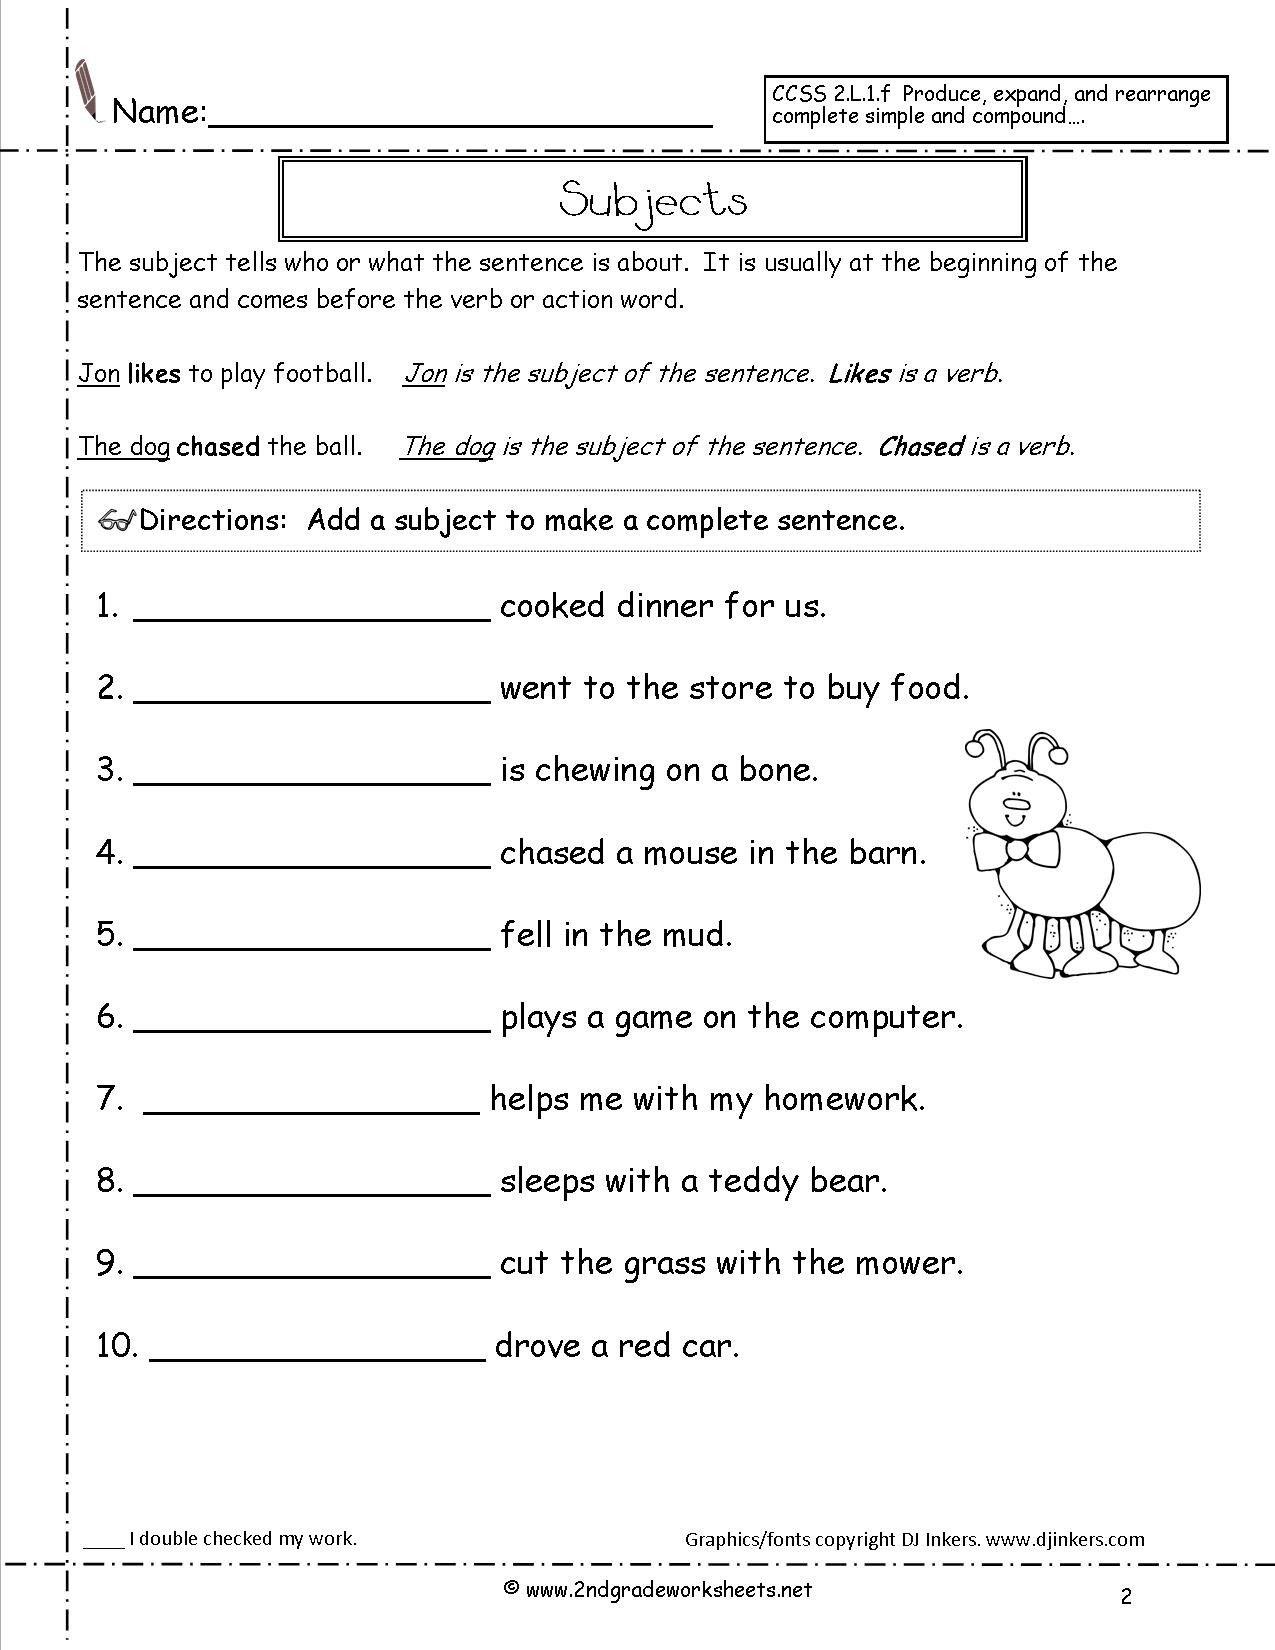 First Grade Sentence Worksheets Second Grade Sentences Worksheets Ccss 2 L Complex Sentences Worksheets Simple Sentences Worksheet Types Of Sentences Worksheet